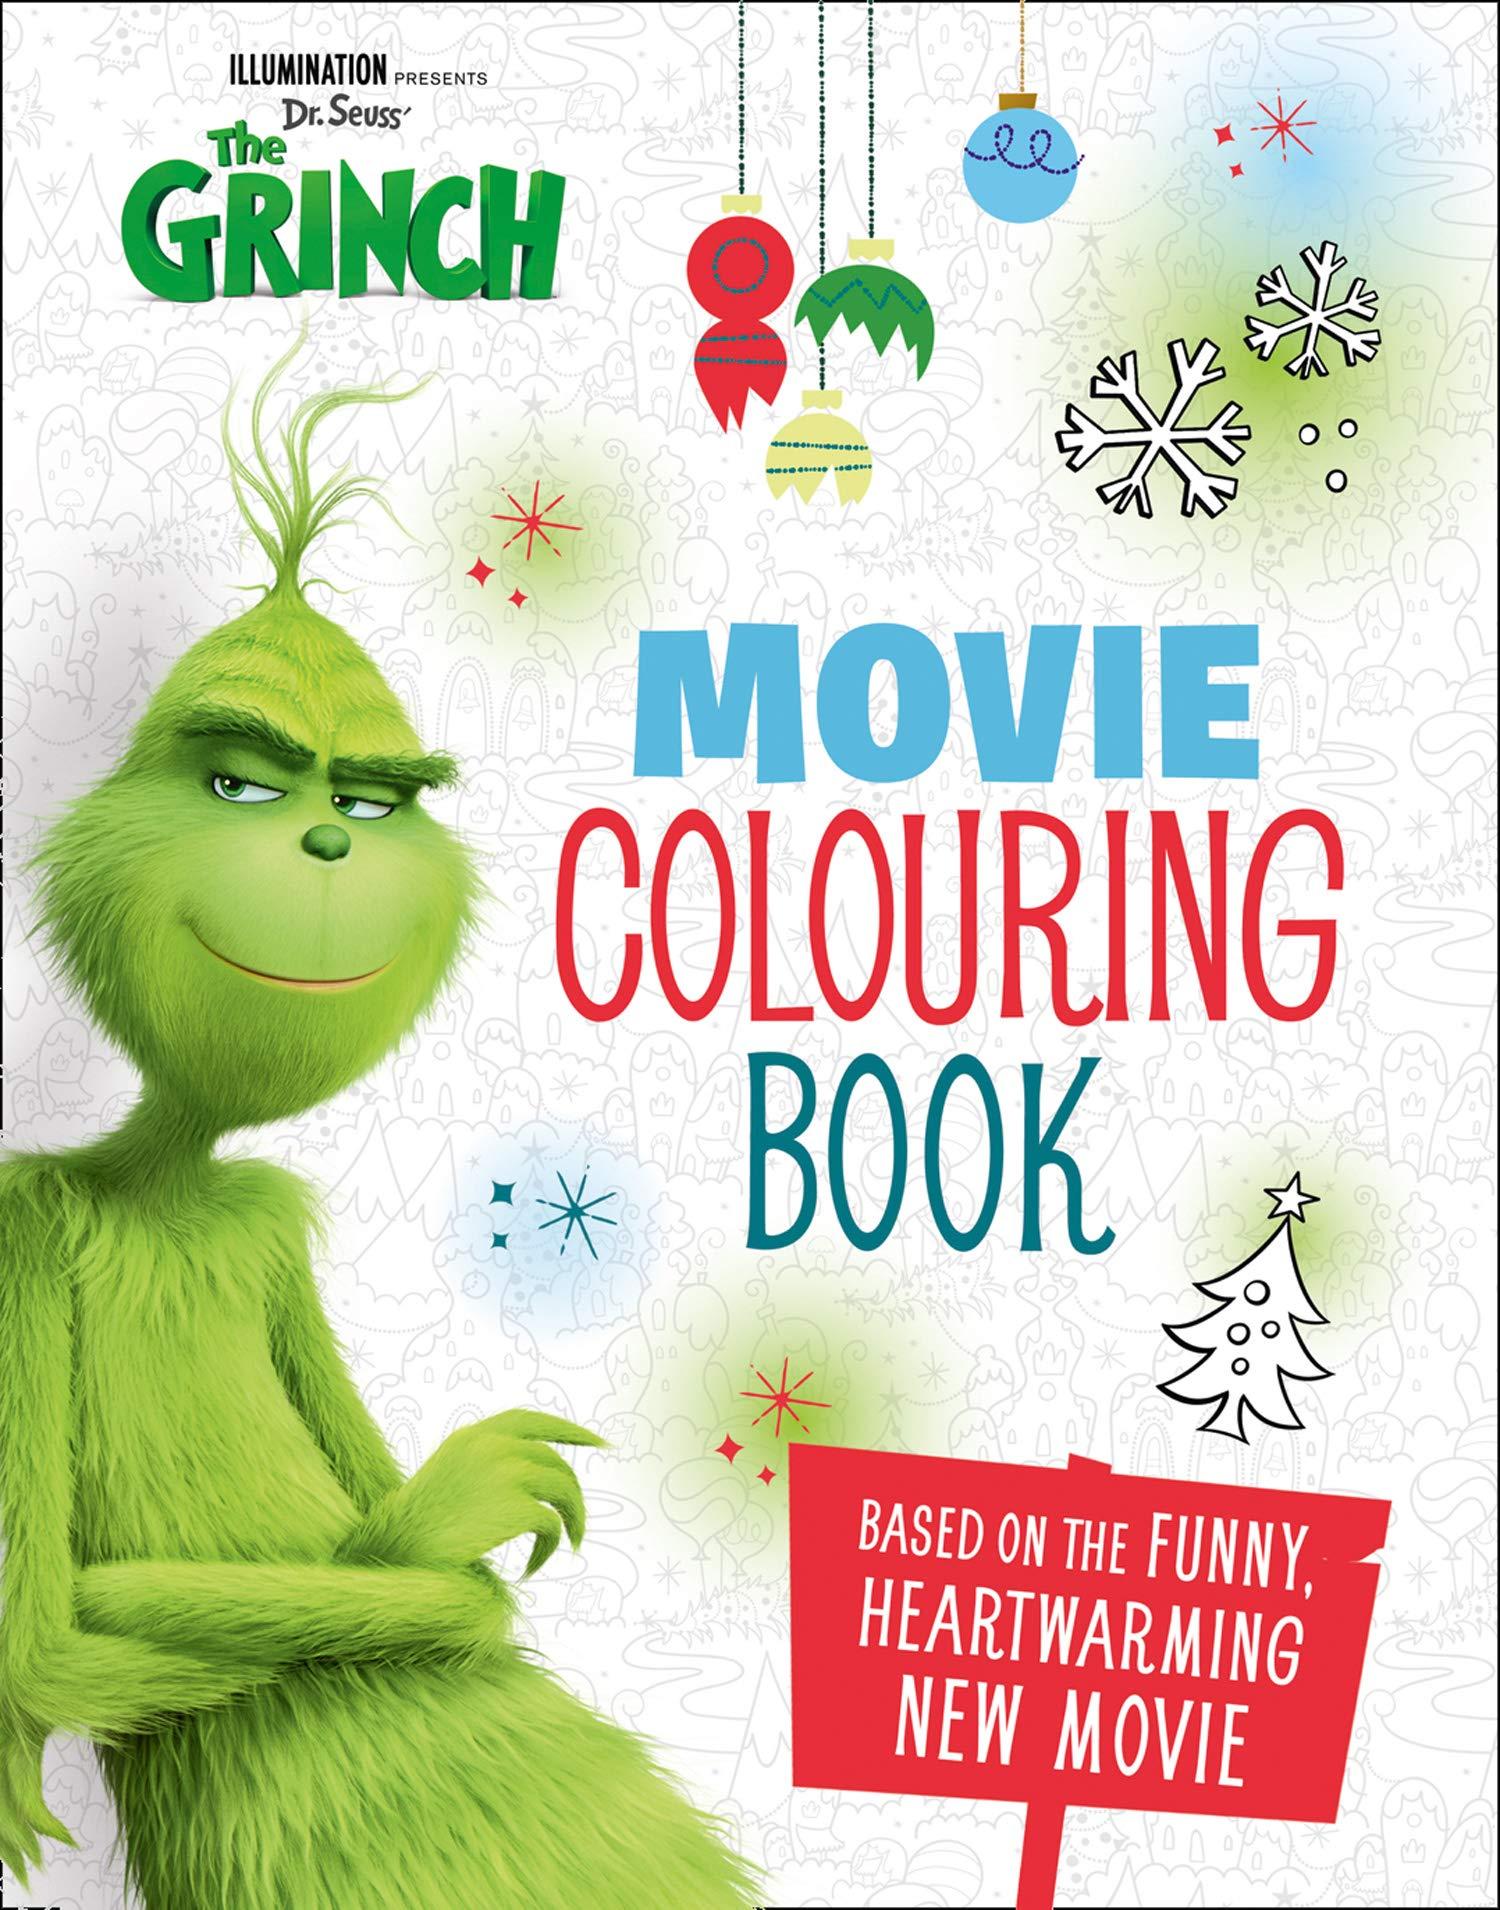 - The Grinch: Movie Colouring Book: Movie Tie-in: NILL, NILL, NILL